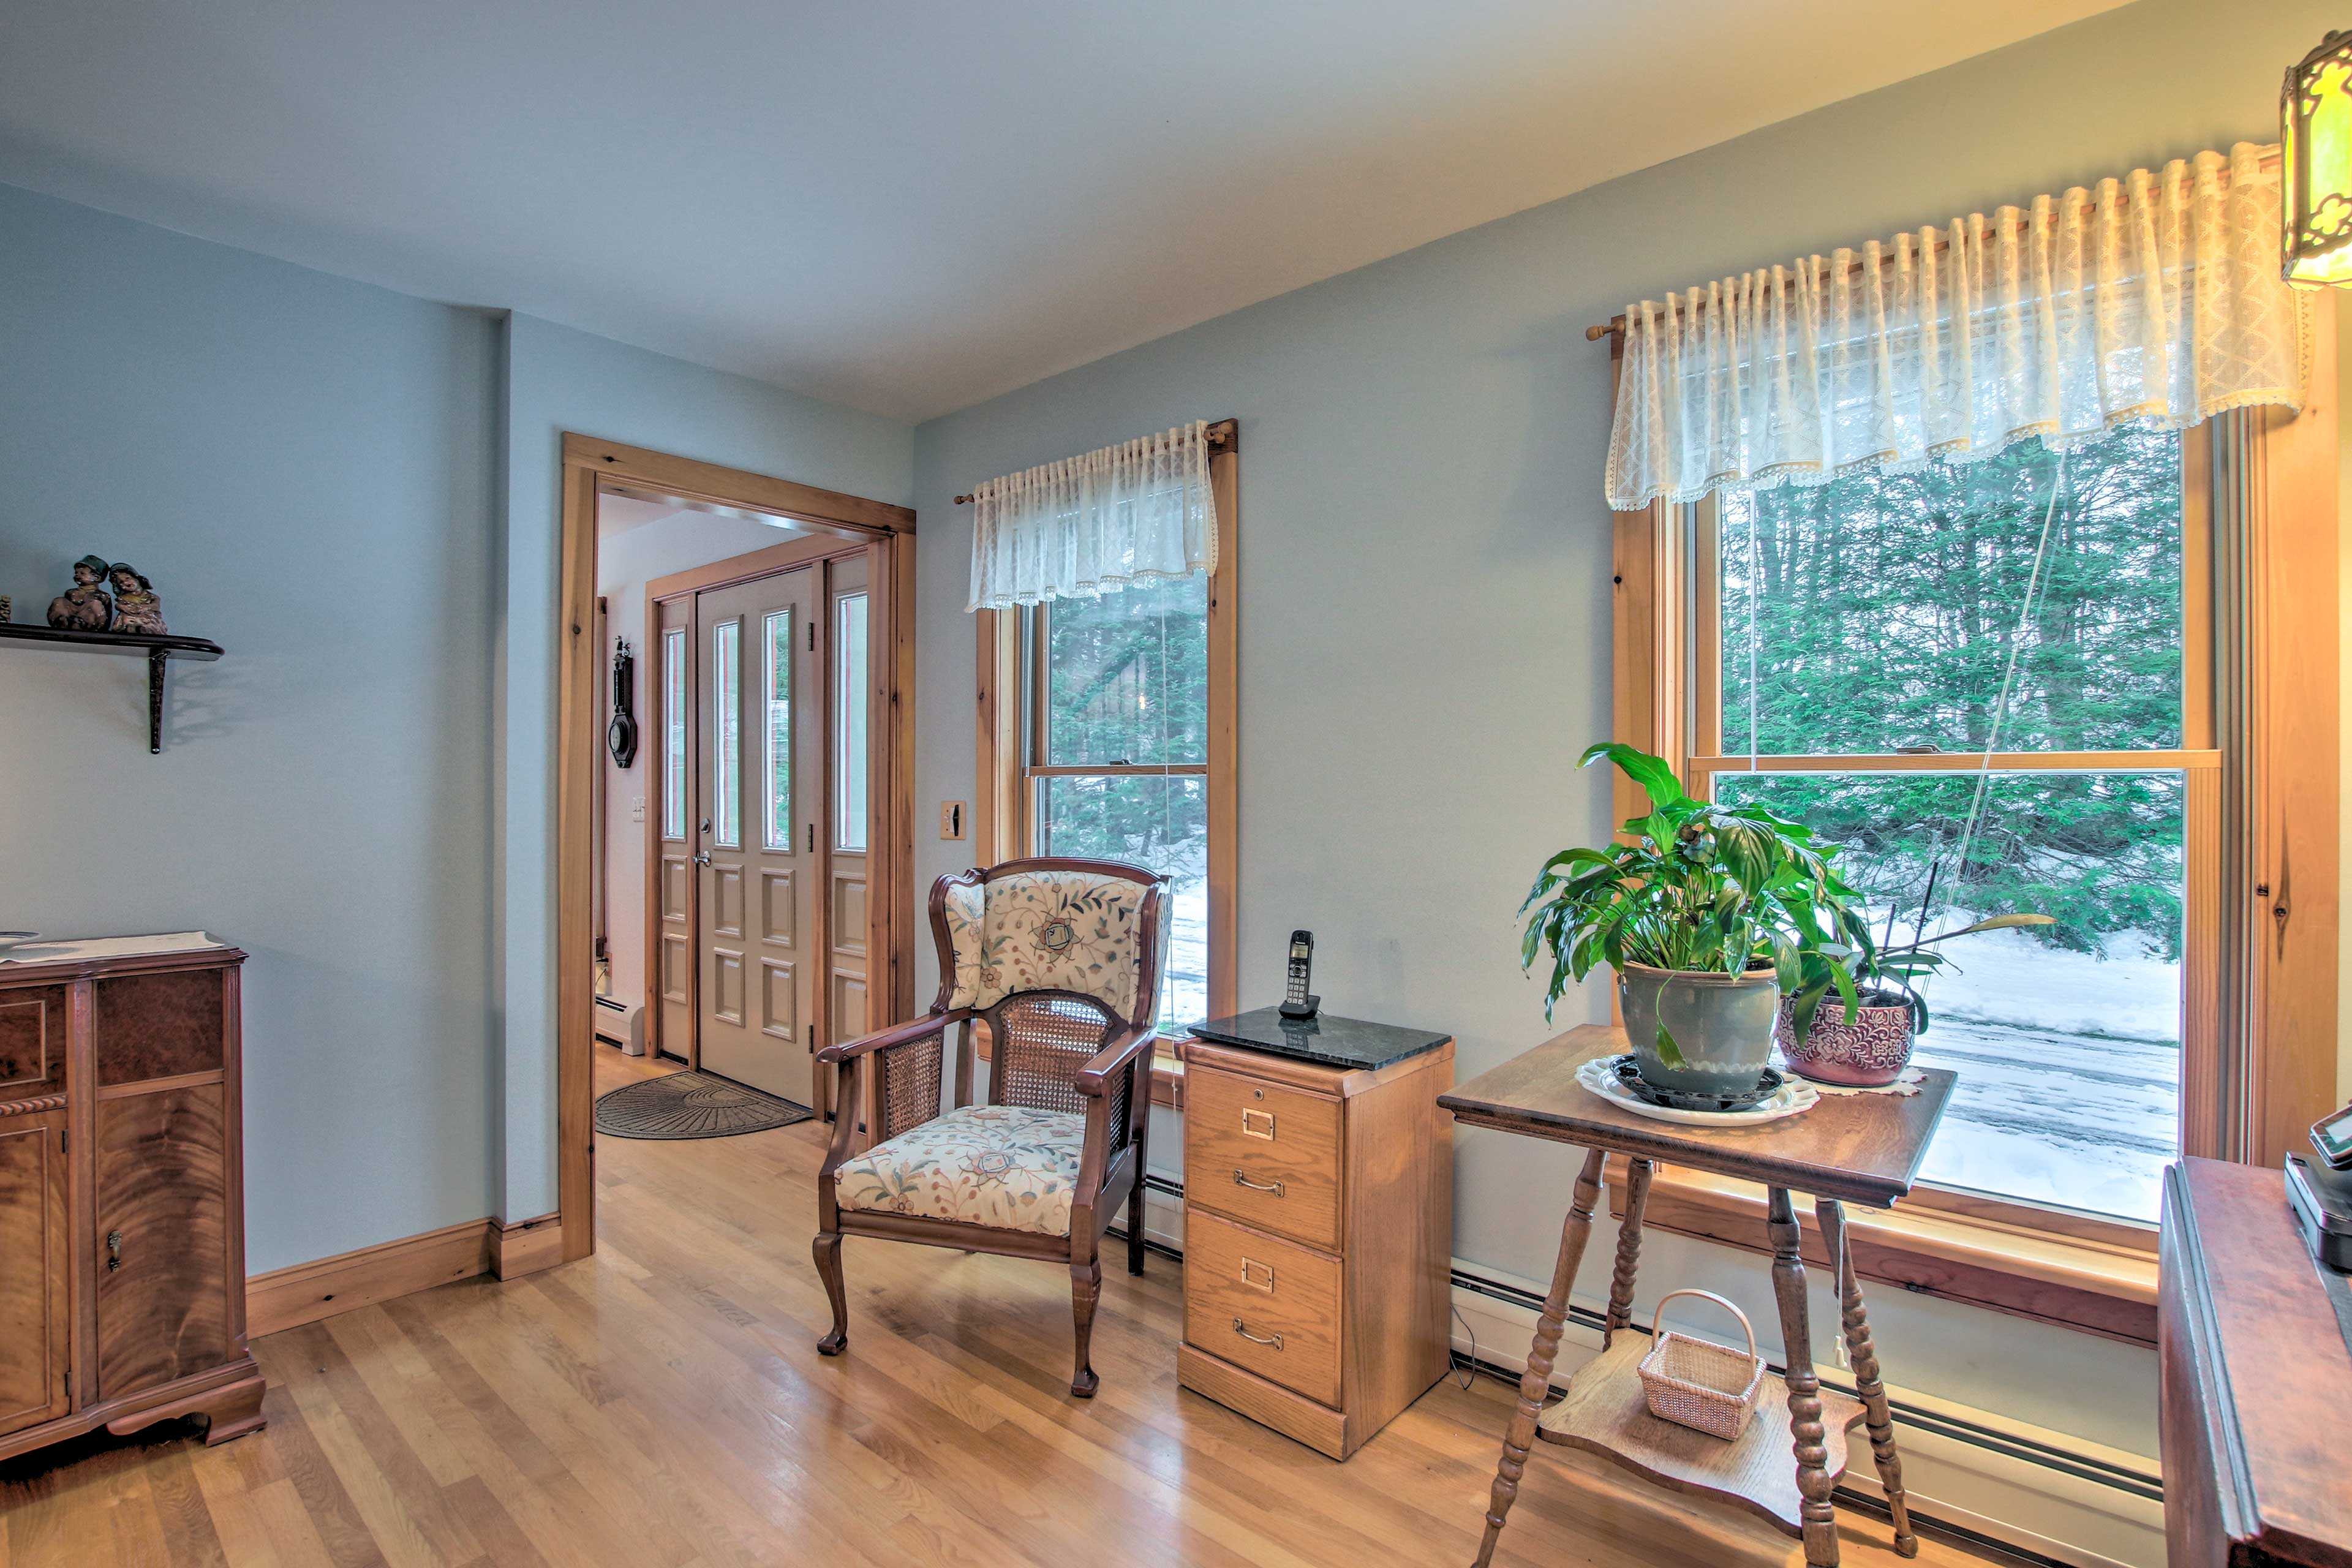 The whole home has hardwood flooring.